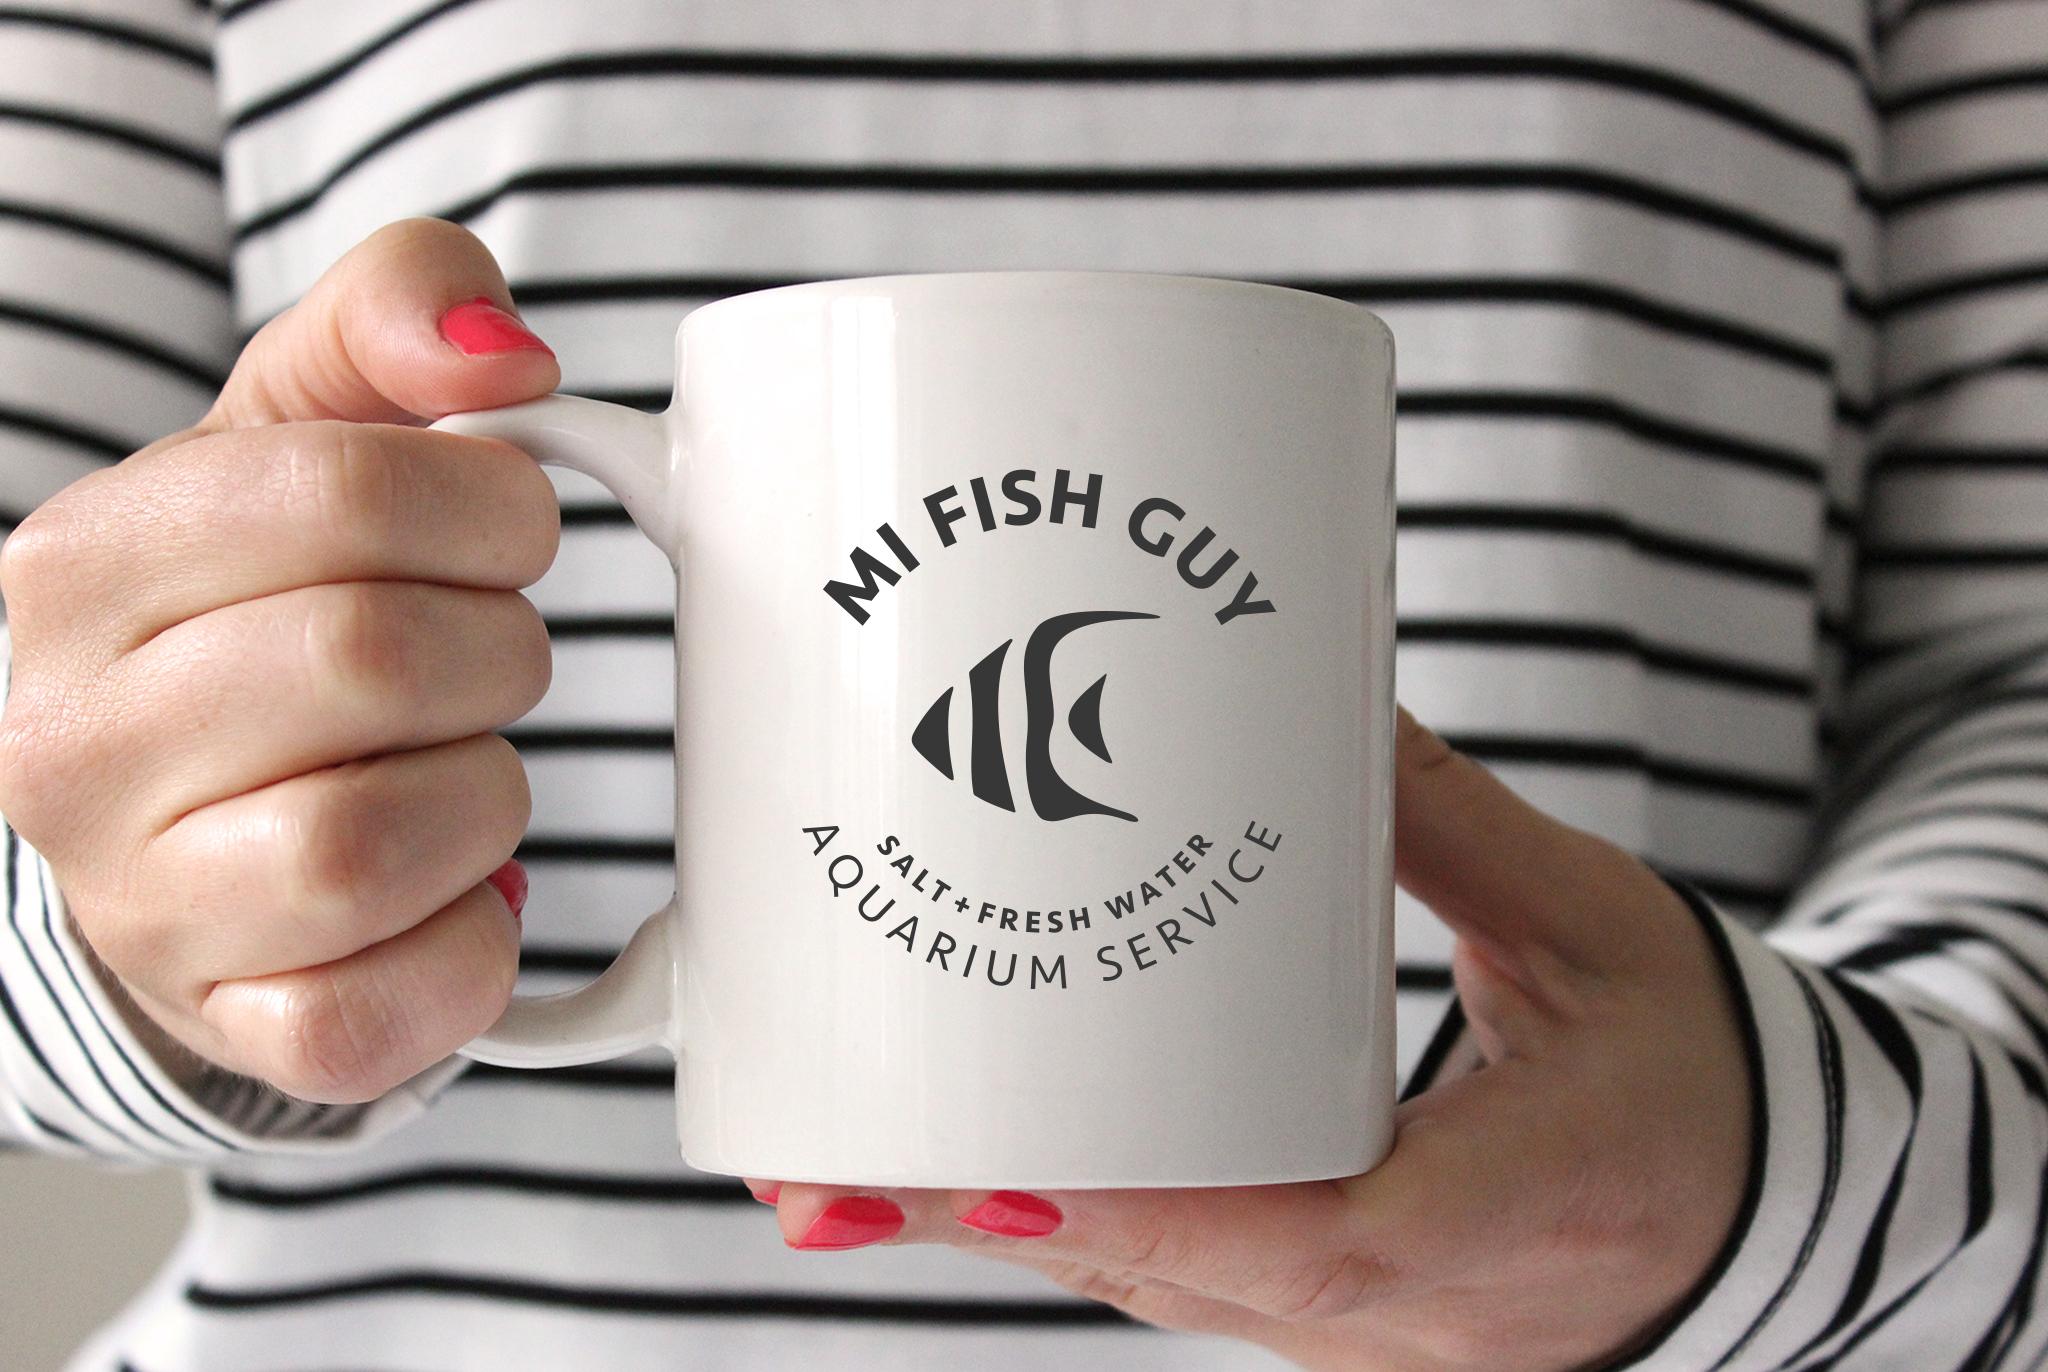 MI Fish Guy logo, logo design, branded logo, branding on coffee mug